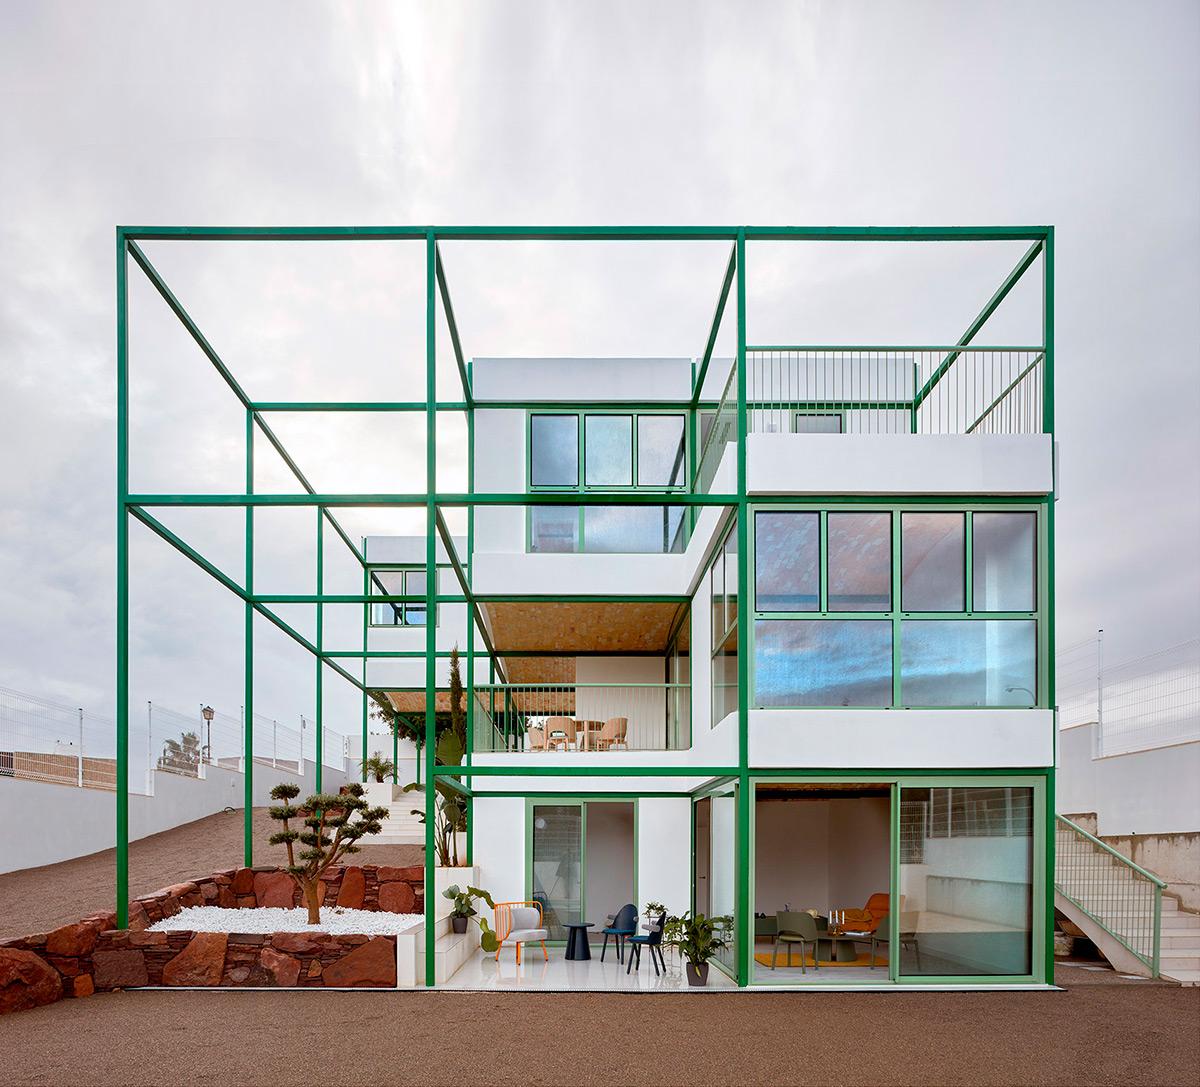 Brick-Vault-House-Space-Popular-Mariela-Apollonio-01